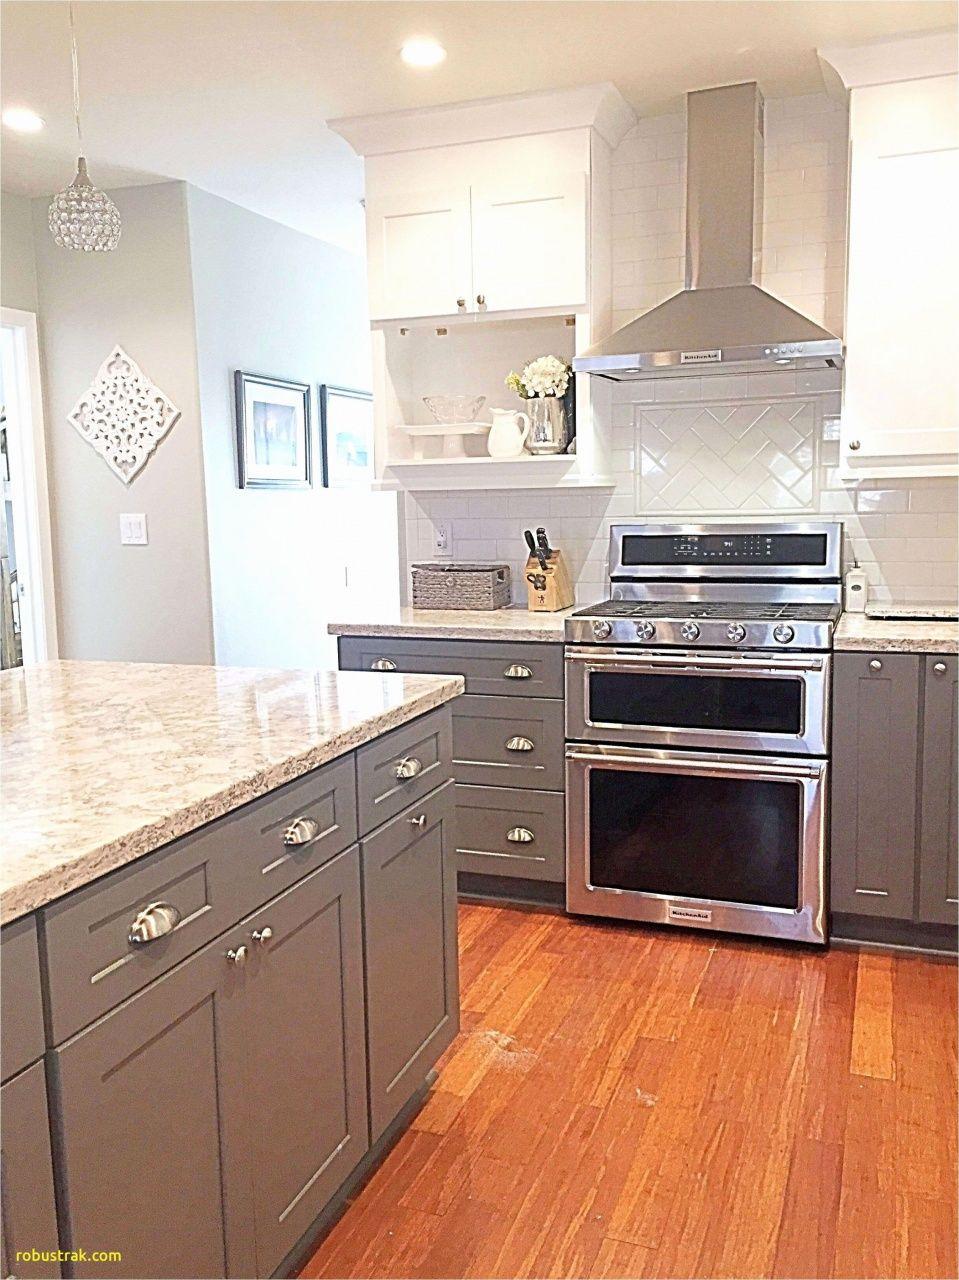 Home Depot Stick On Backsplash In 2020 New Kitchen Cabinets Kitchen Design Kitchen Cabinets Makeover